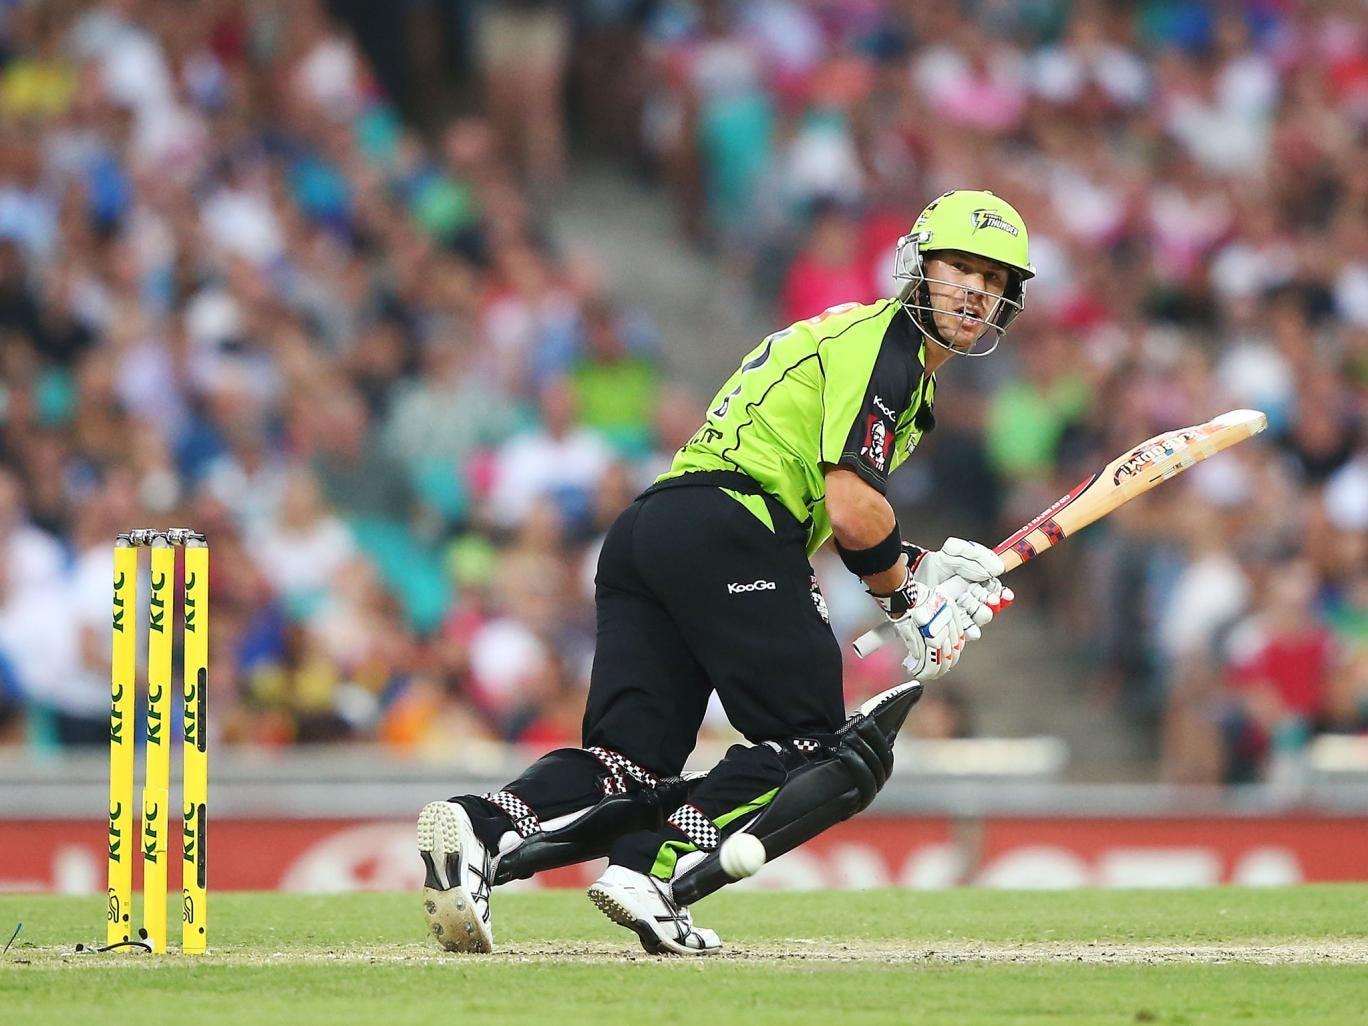 Australia batsman David Warner in action for the Sydney Sixers